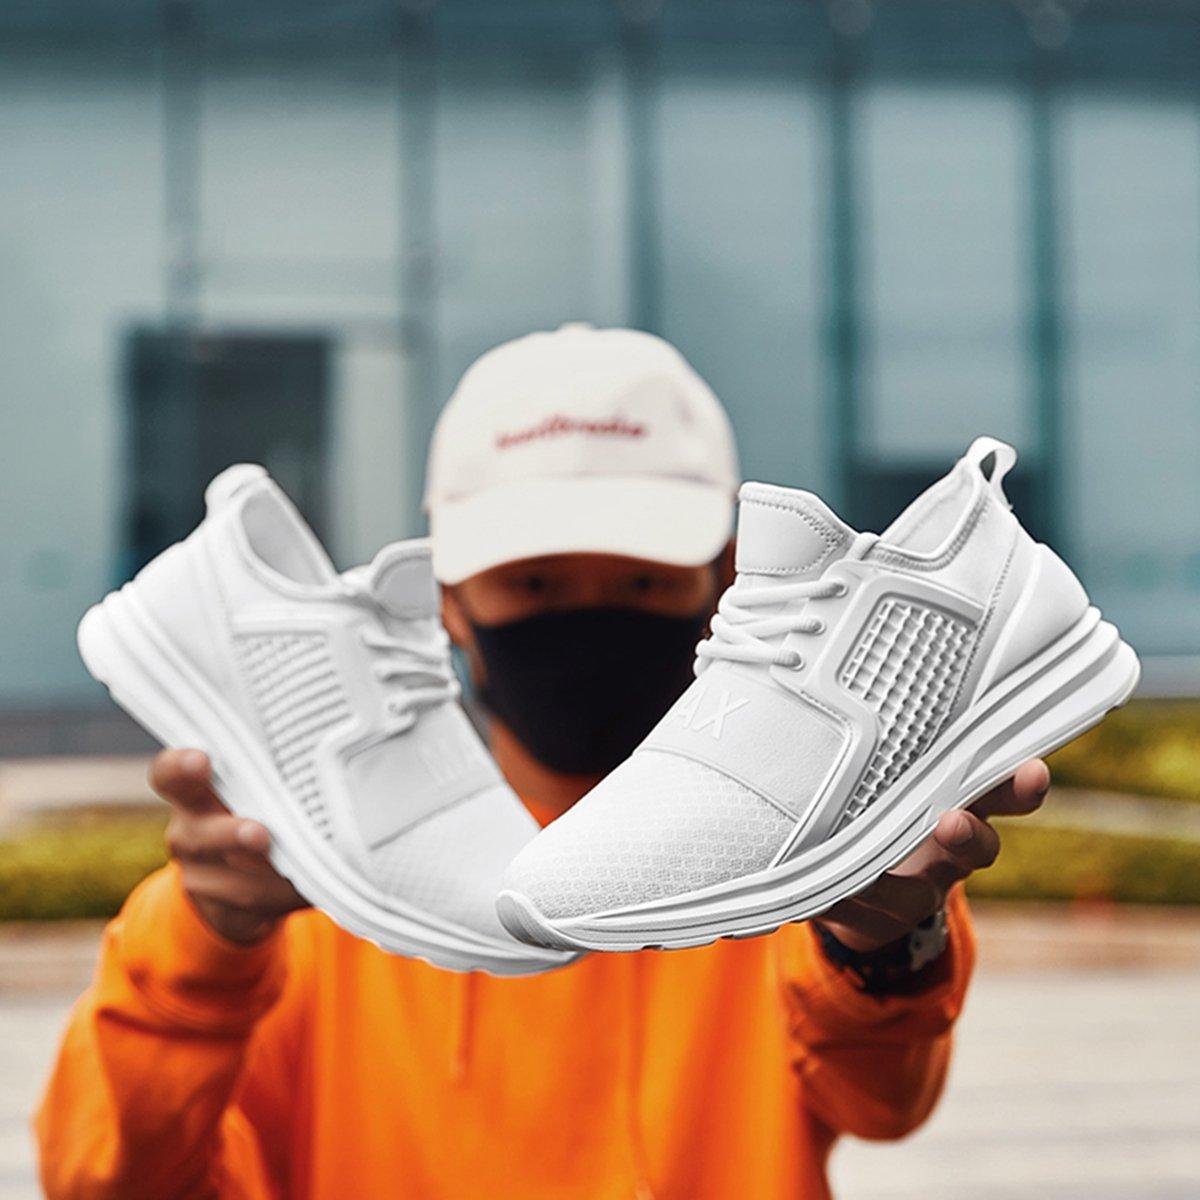 Resonda Mens Running Shoes Casual Fashion Sneakers Lightweight Athletic Walking Sport Shoes for Men B07FF3LXNW 8 B(M) US|02-white